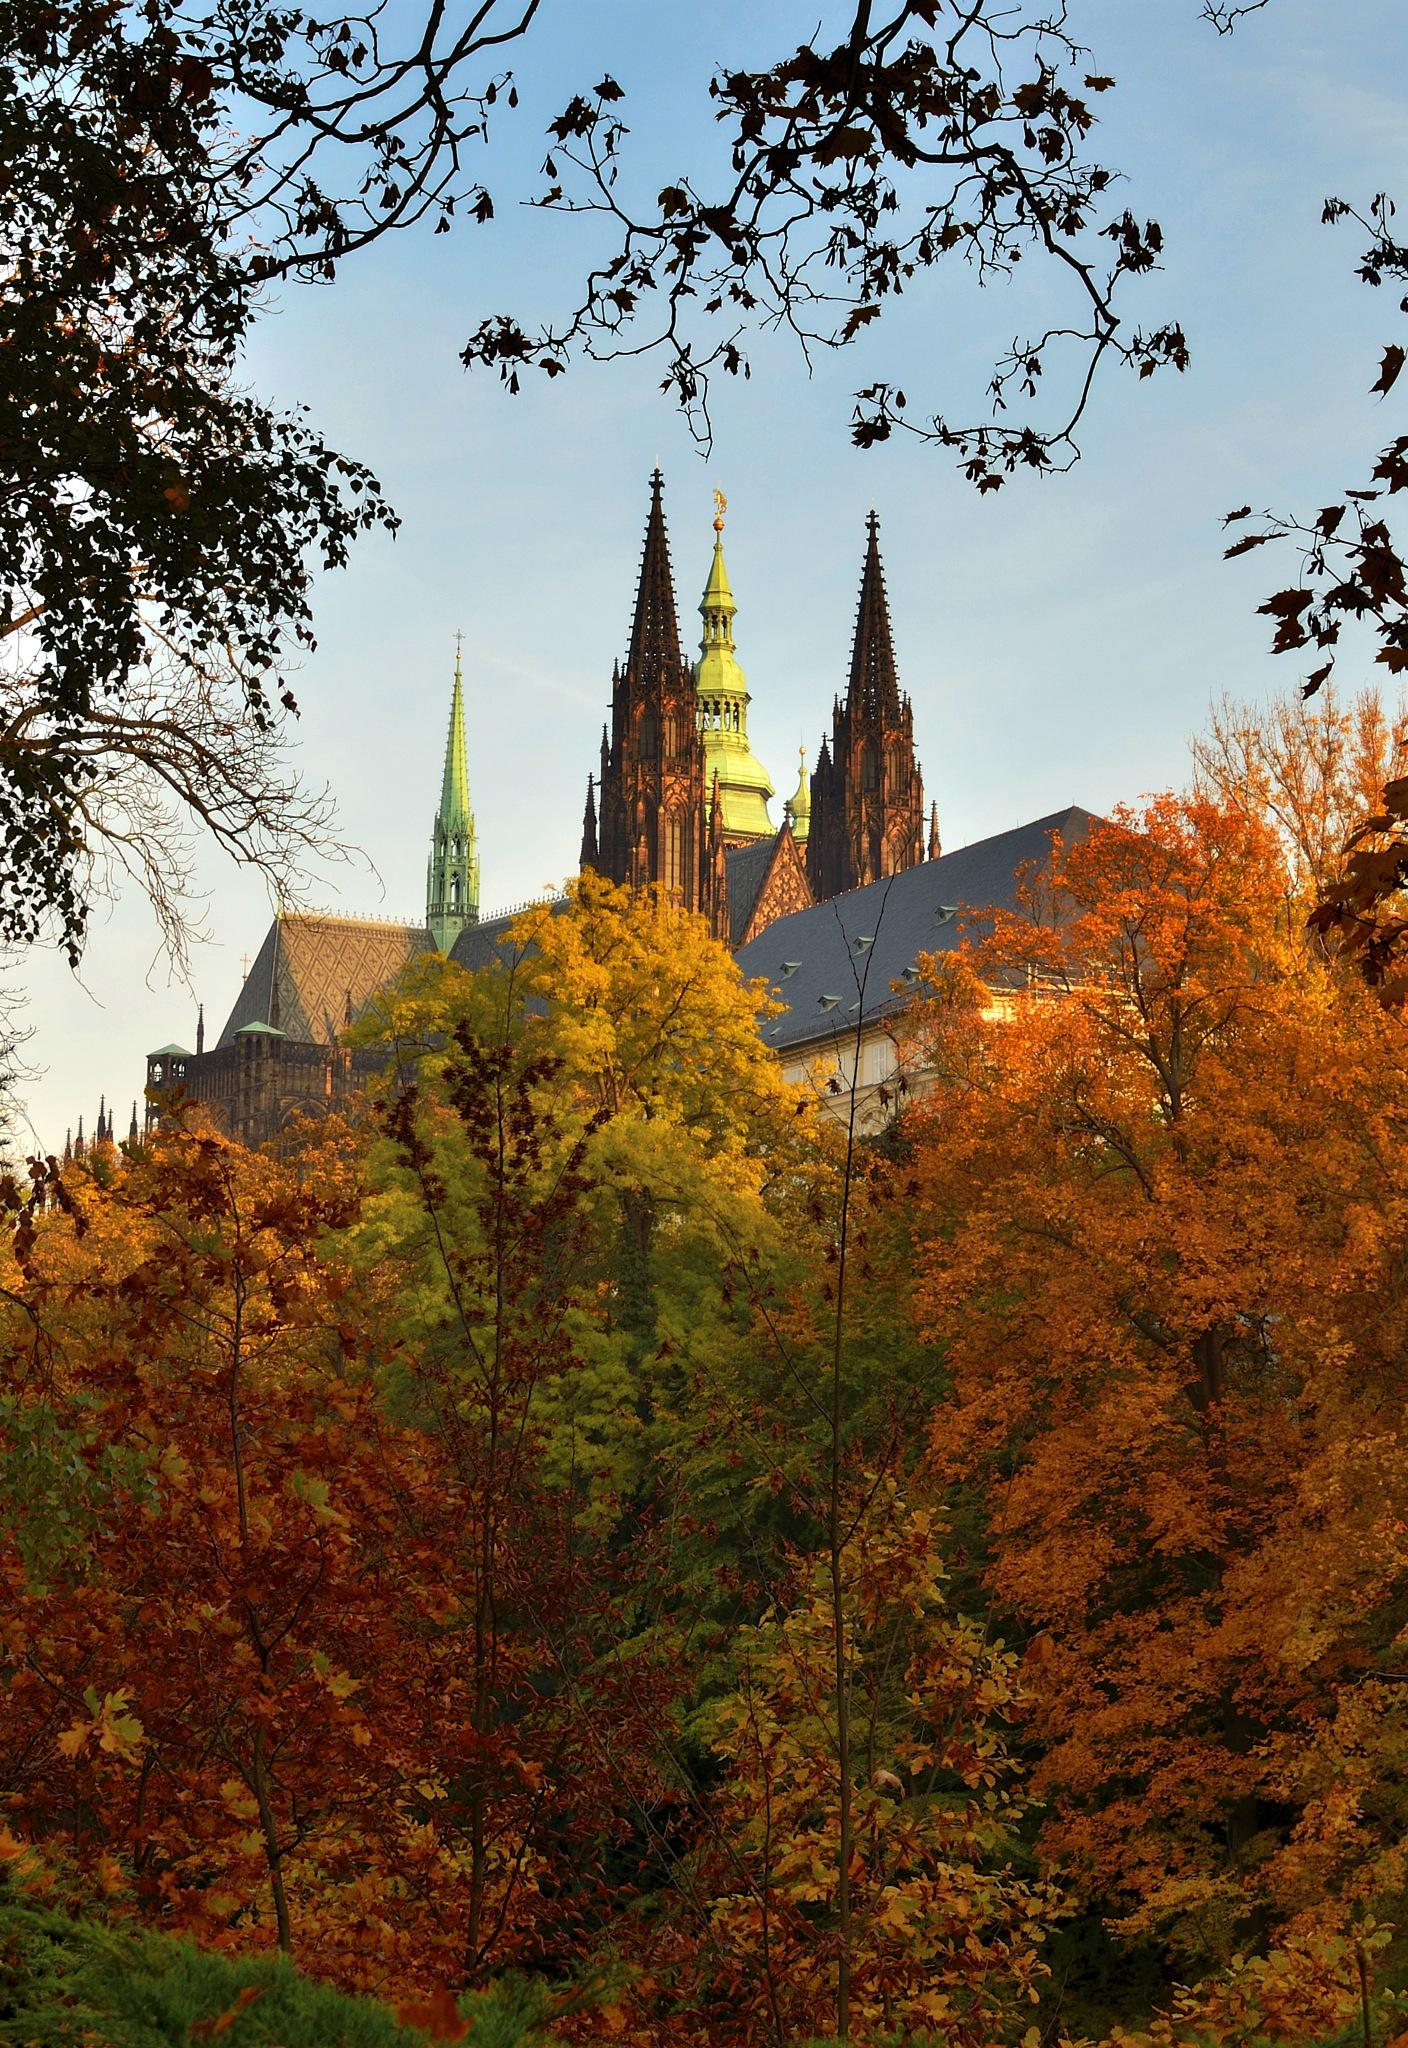 Autumn by Edwards